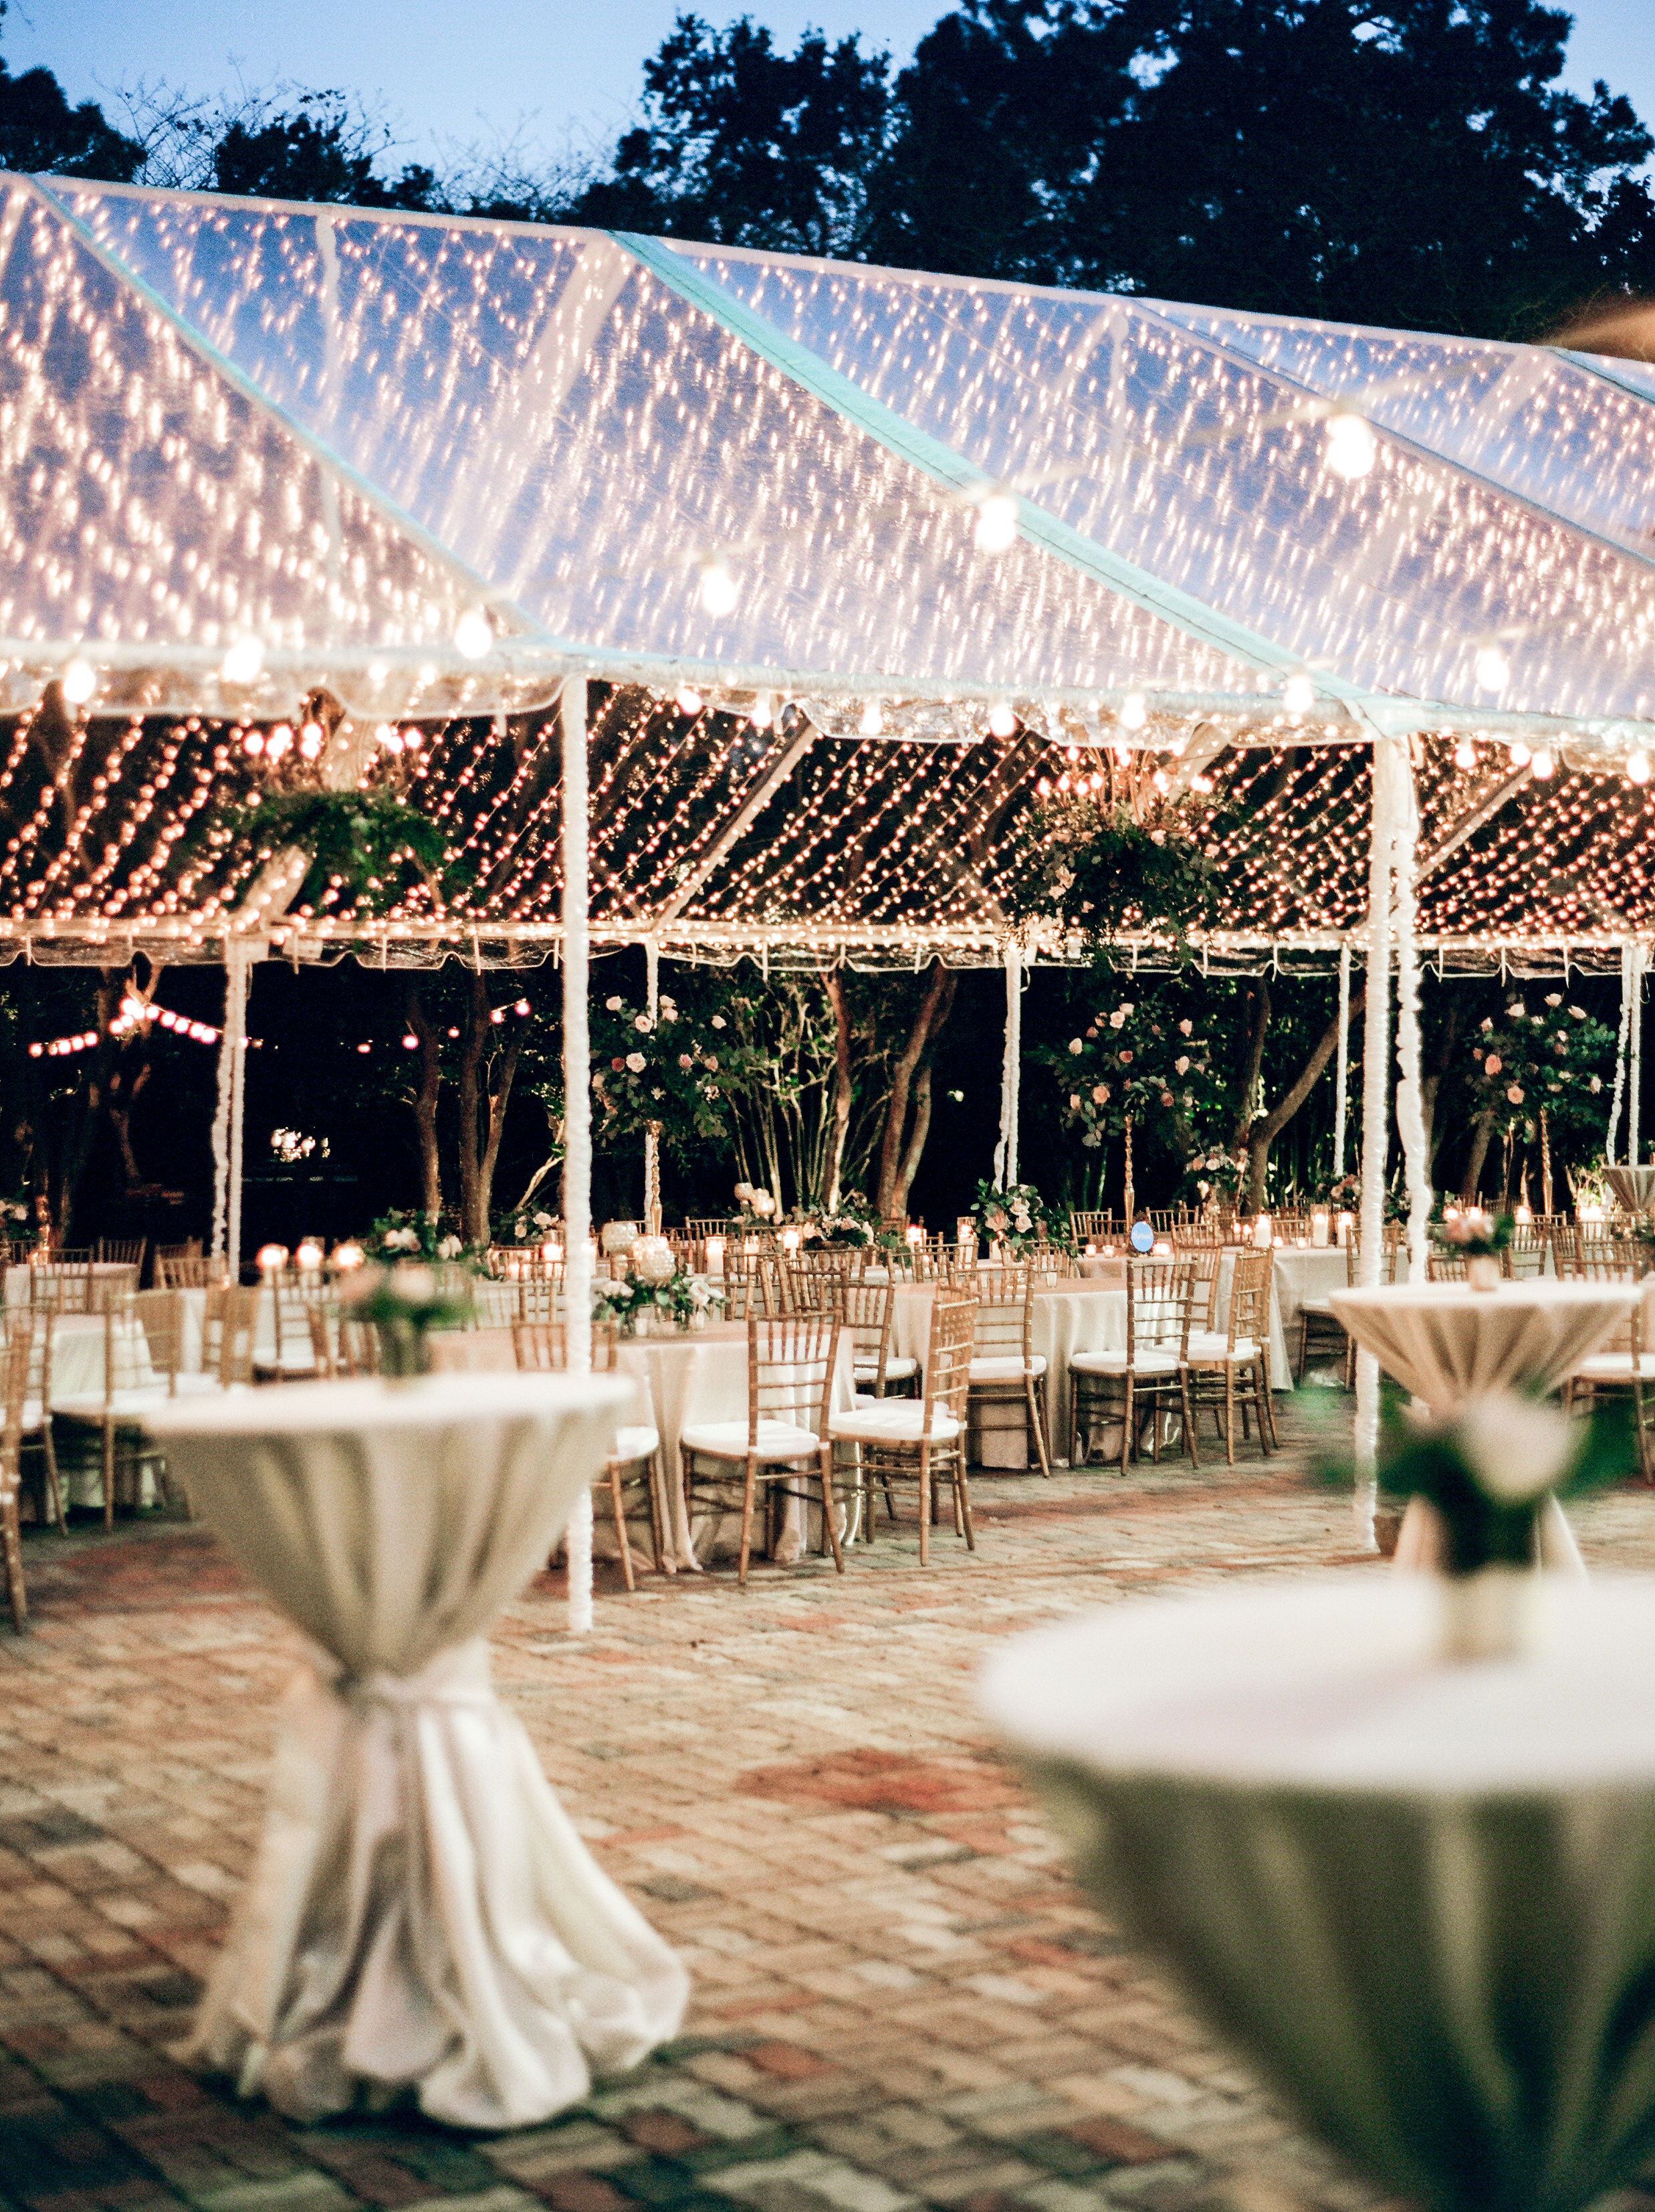 Southern Fete, Southern Wedding, Tent Reception, Light Decor